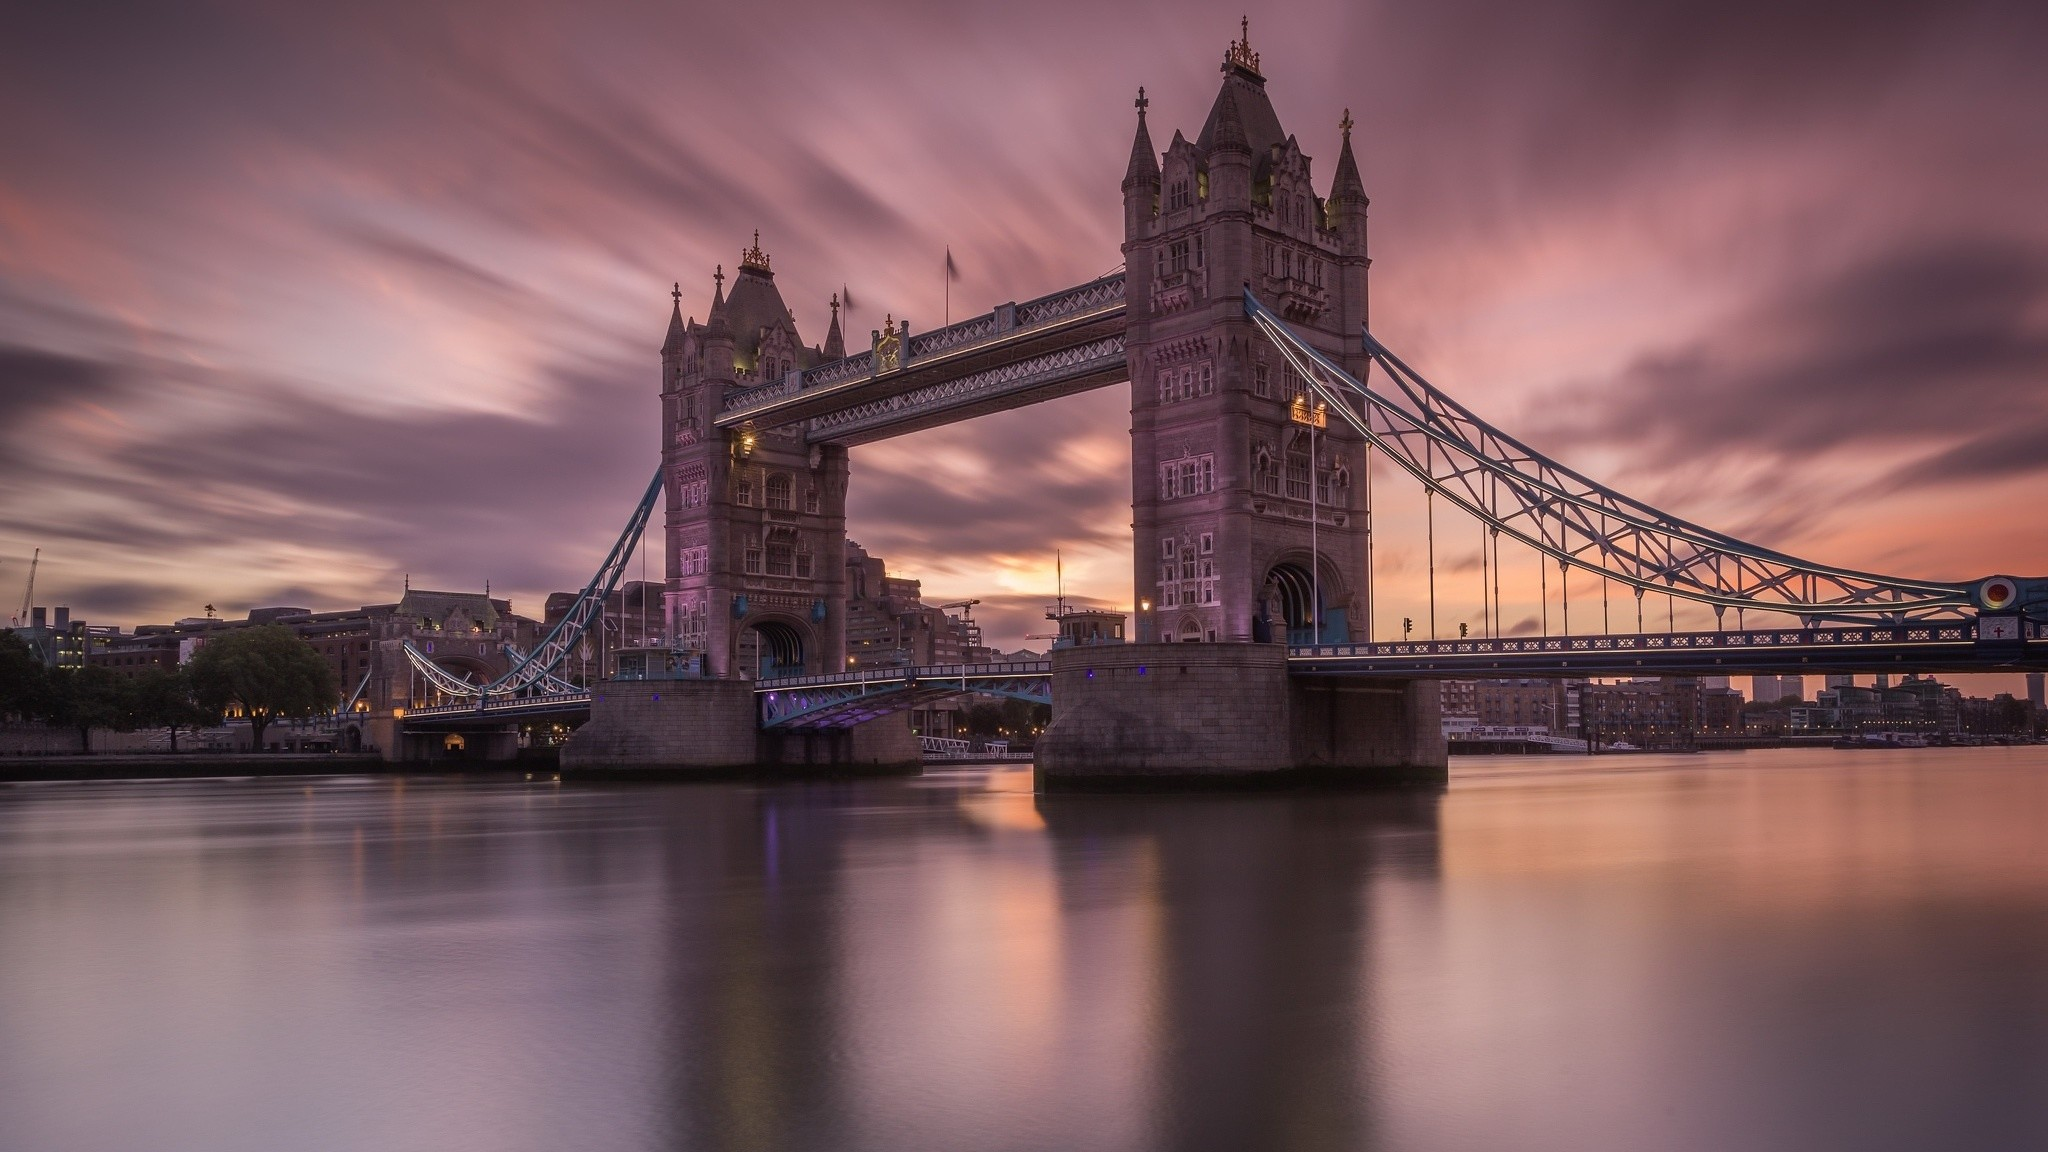 Res: 2048x1152, london-thames-tower-bridge-08.jpg